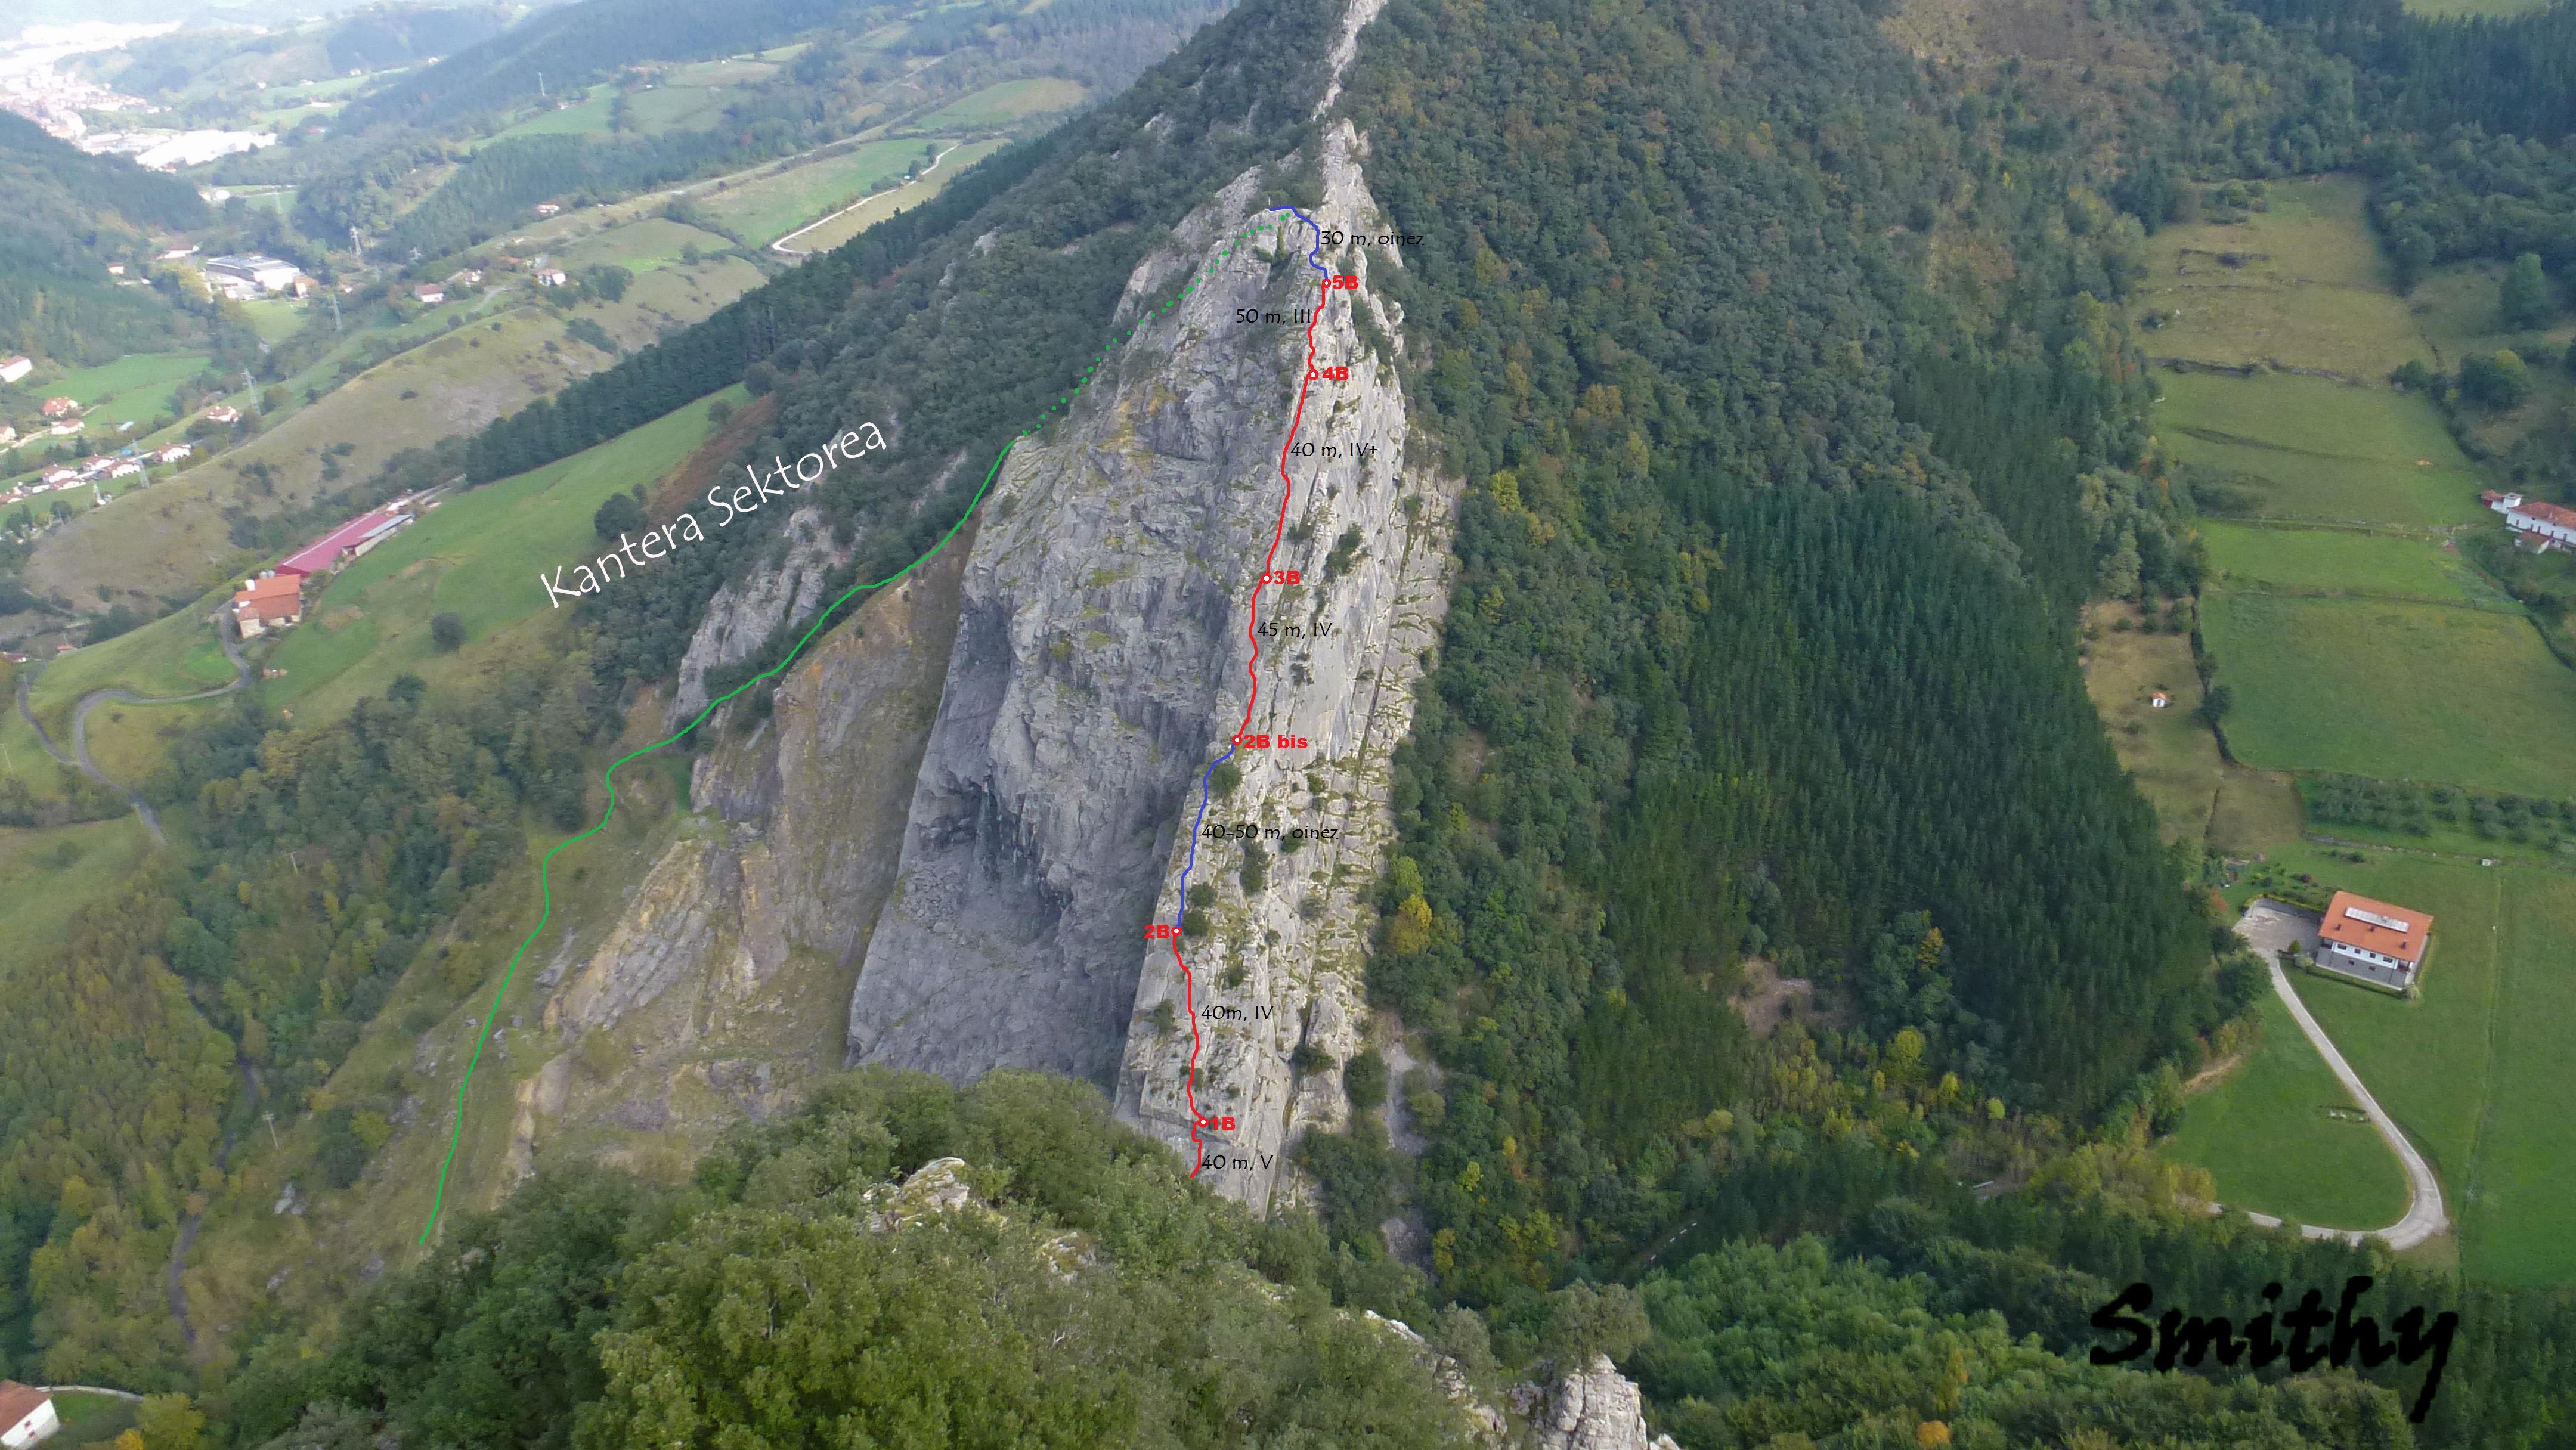 Jentilbaratza (465 m), Hego-mendebaldeko gandorratik, 260 m, V